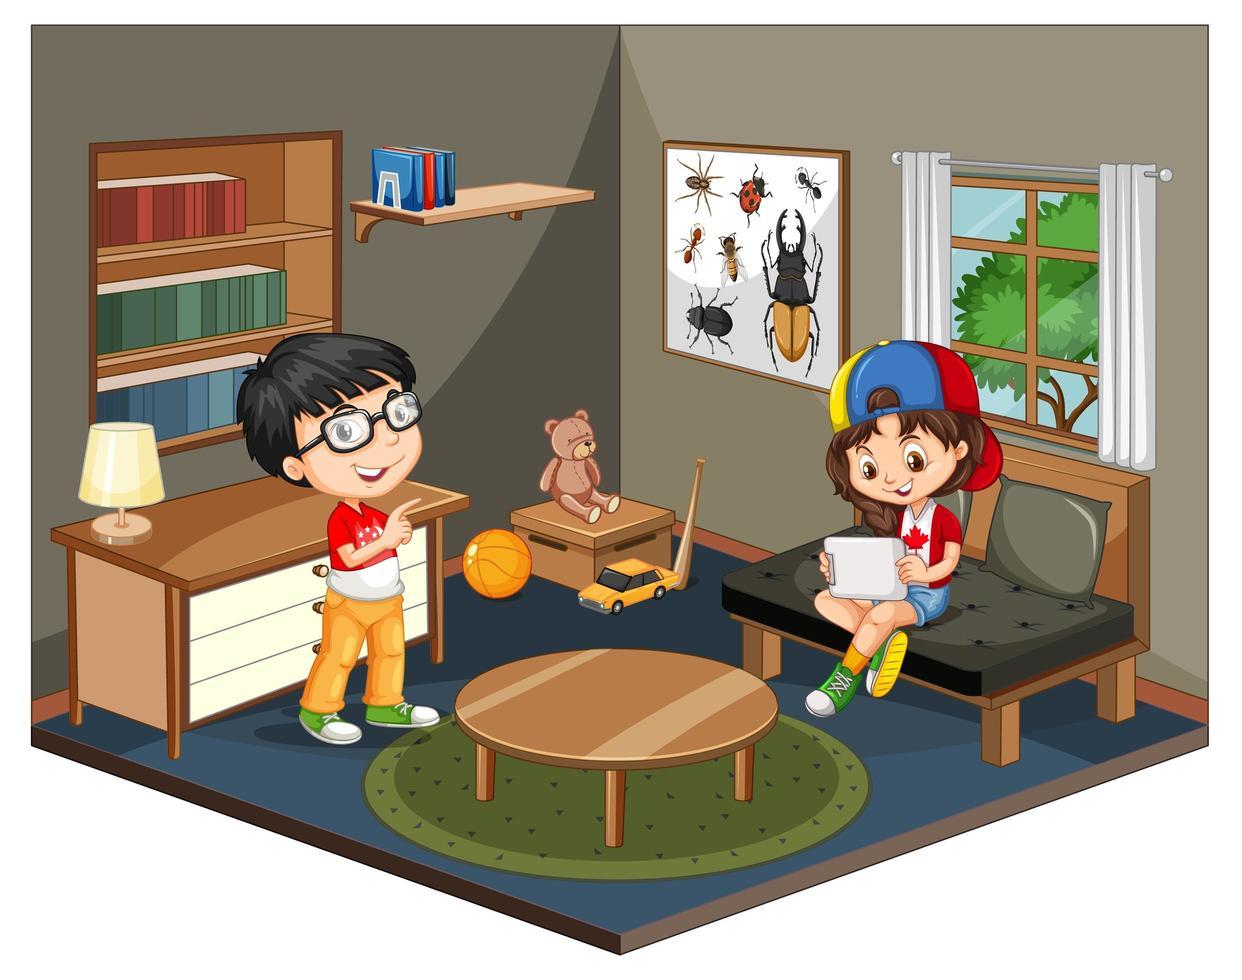 Kids in living room scene vector